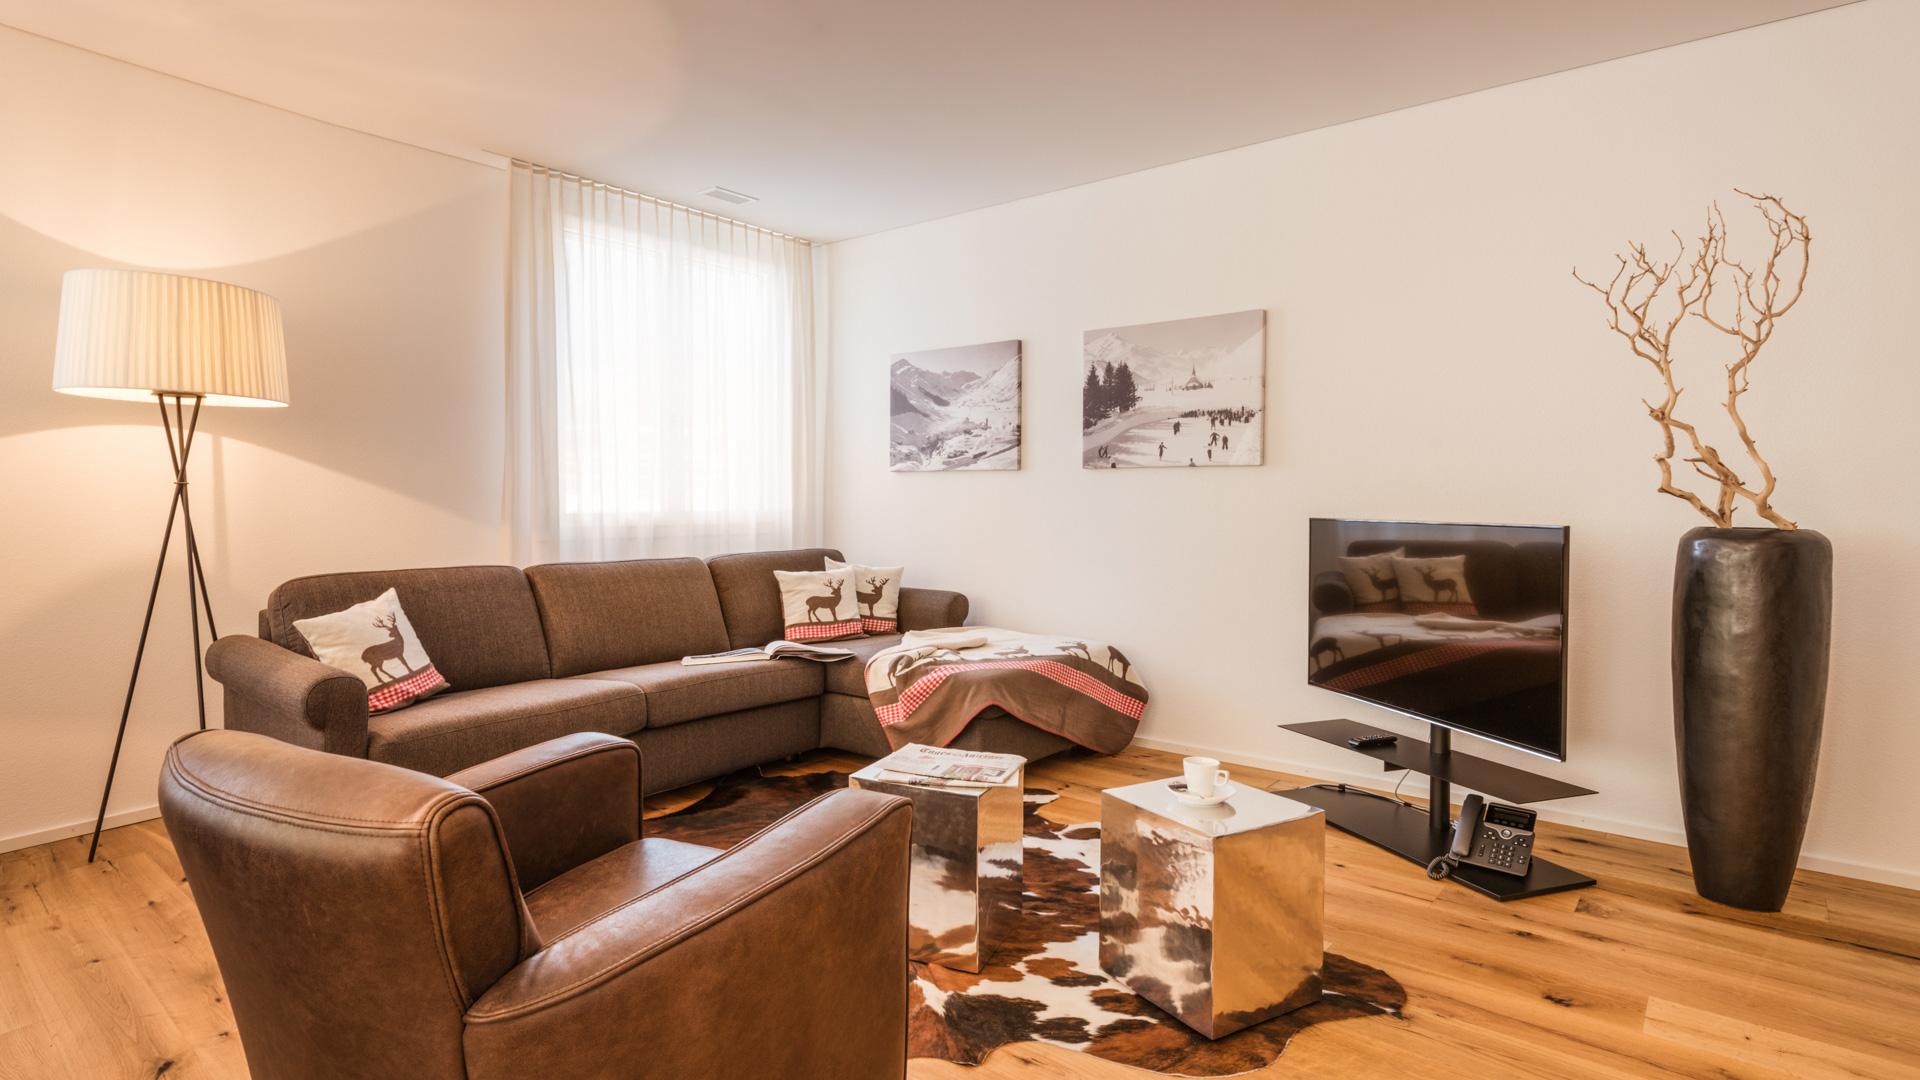 House Biber Apartments, Switzerland